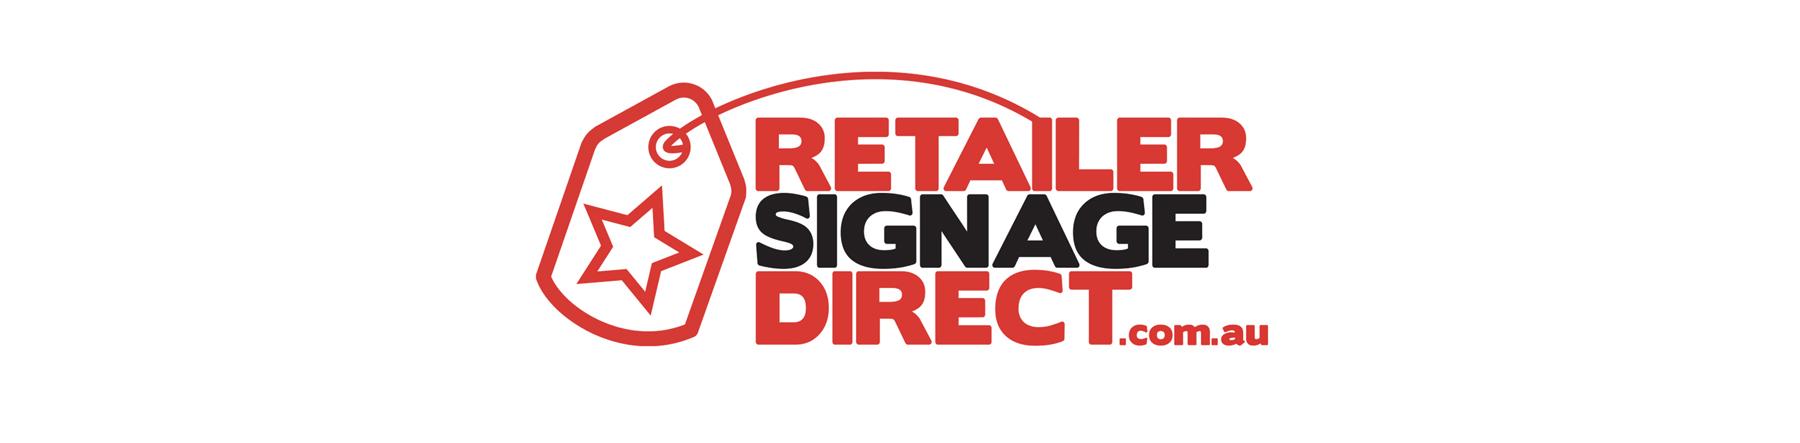 Retailer Signage Direct Logo Banner